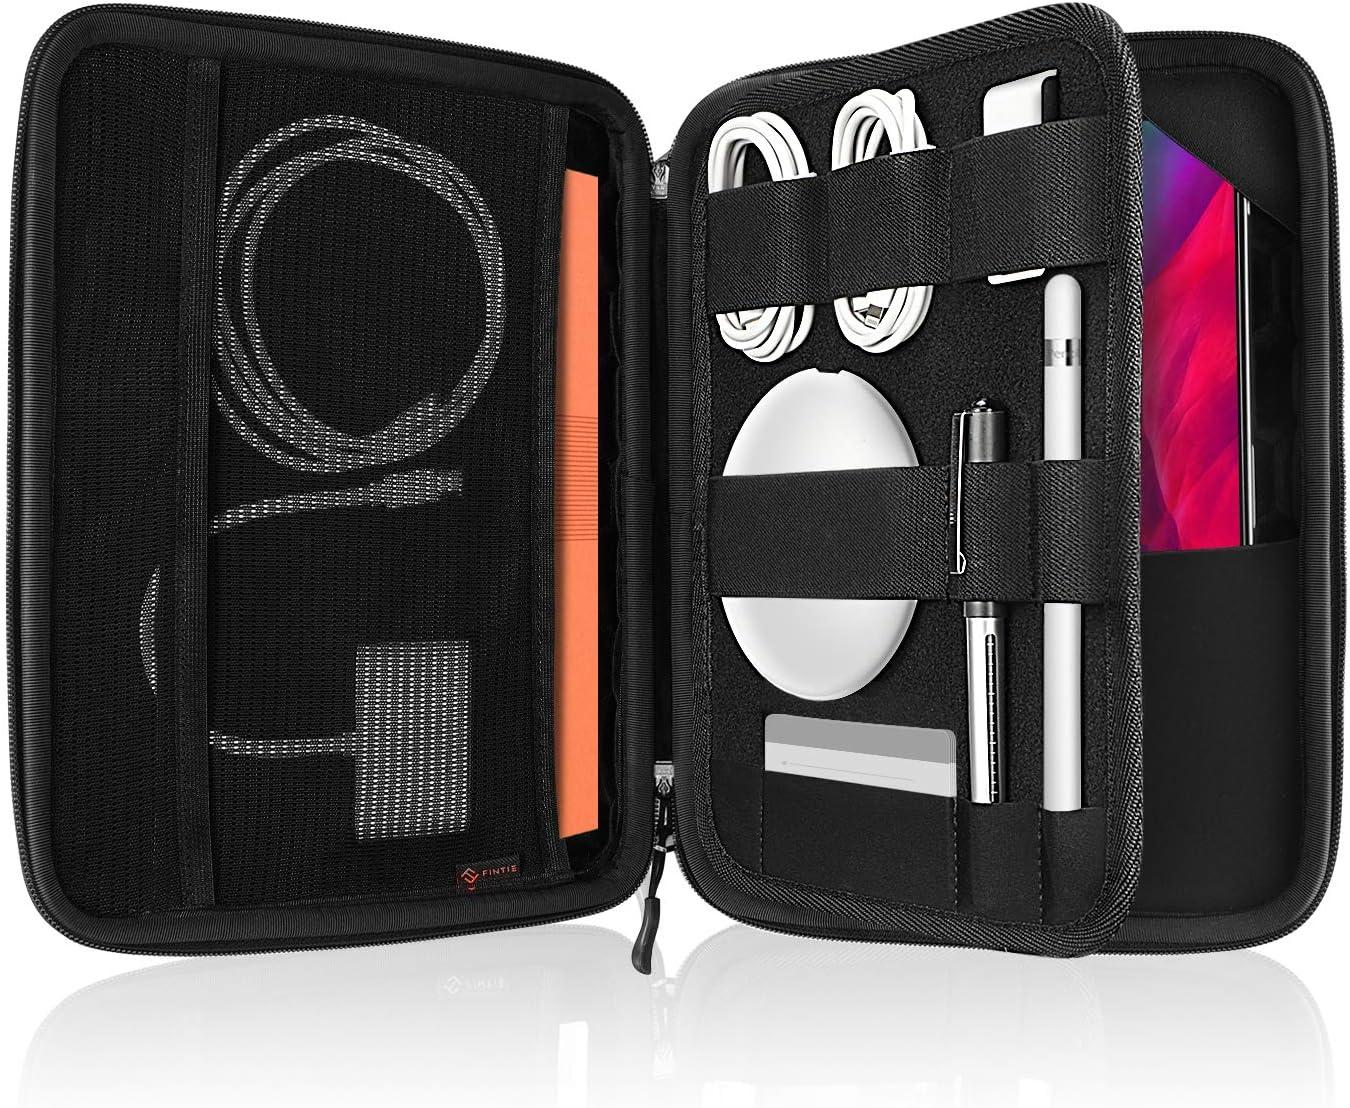 "FINPAC Portfolio Sleeve Bag for 10.9'' iPad Air 4 11'' iPad Pro 10.2"" iPad 10.5"" iPad Air/Pro 9.7"" iPad, 11 Inch Tablet Hard Carrying Case with Accessory Organizer Storage, Black"